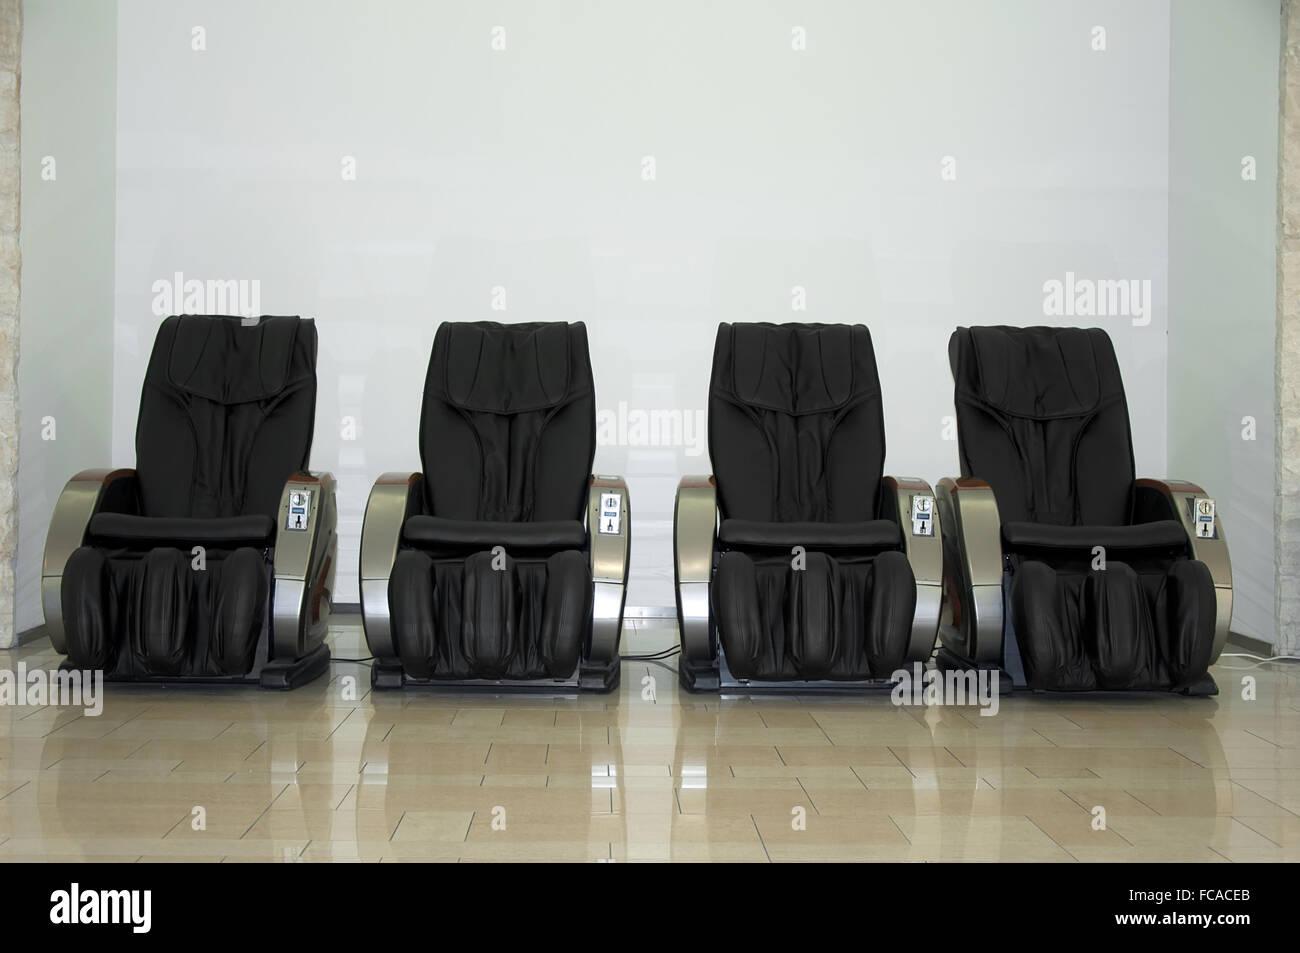 massage chairs stock photos u0026 massage chairs stock images alamy